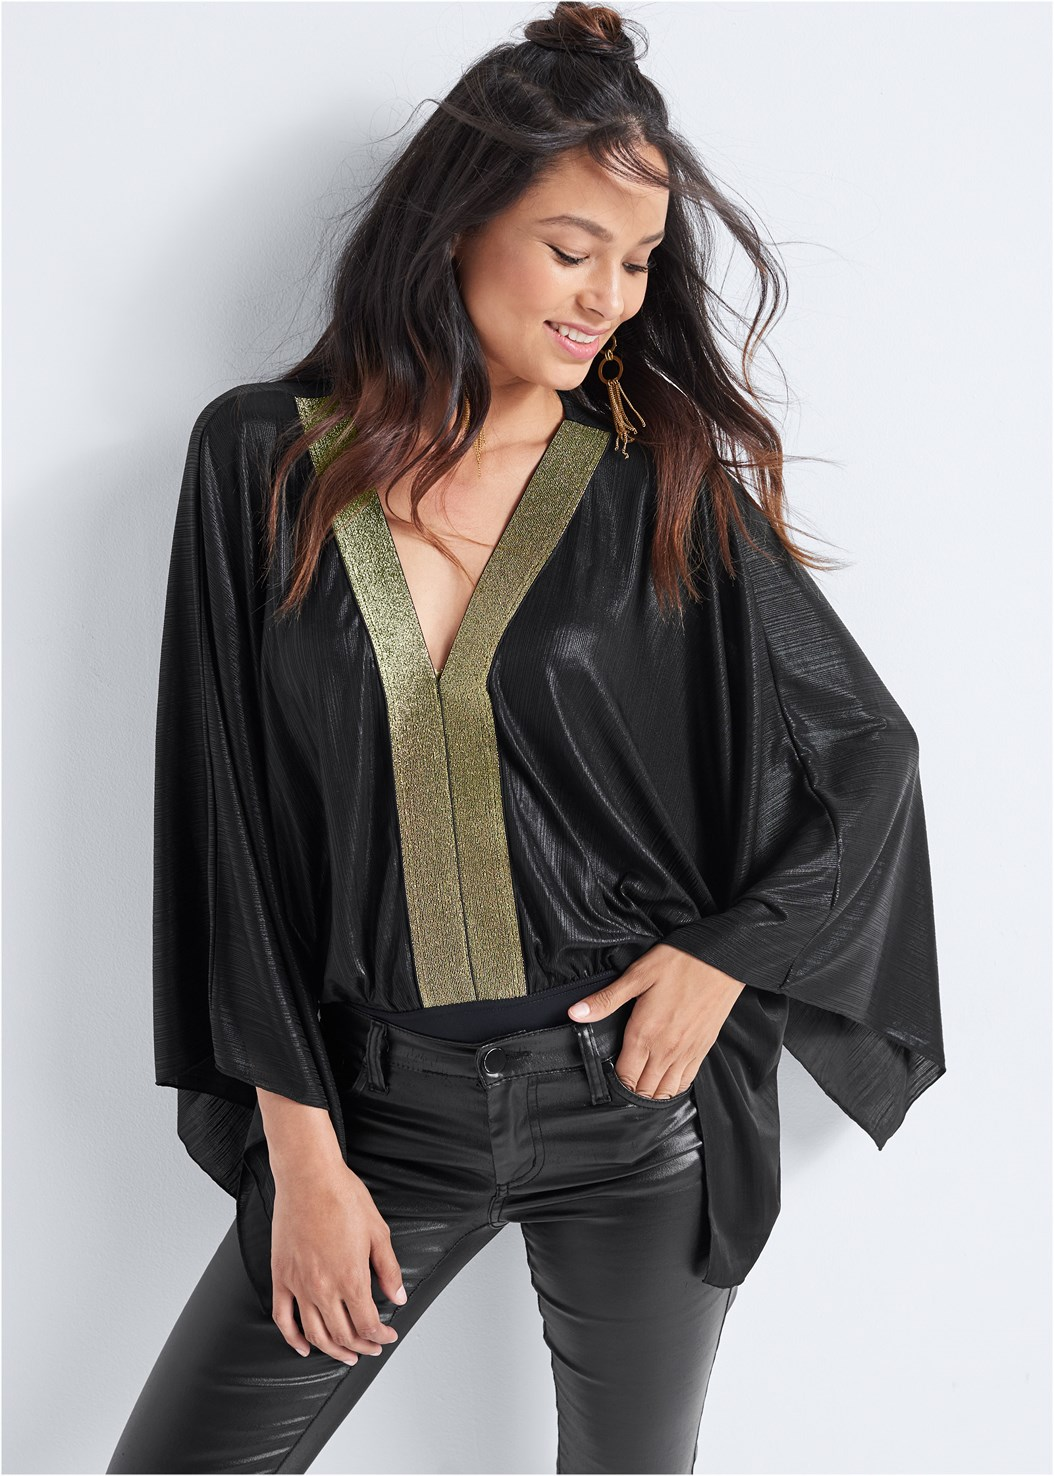 Statement Sleeve Bodysuit,Faux Leather Pants